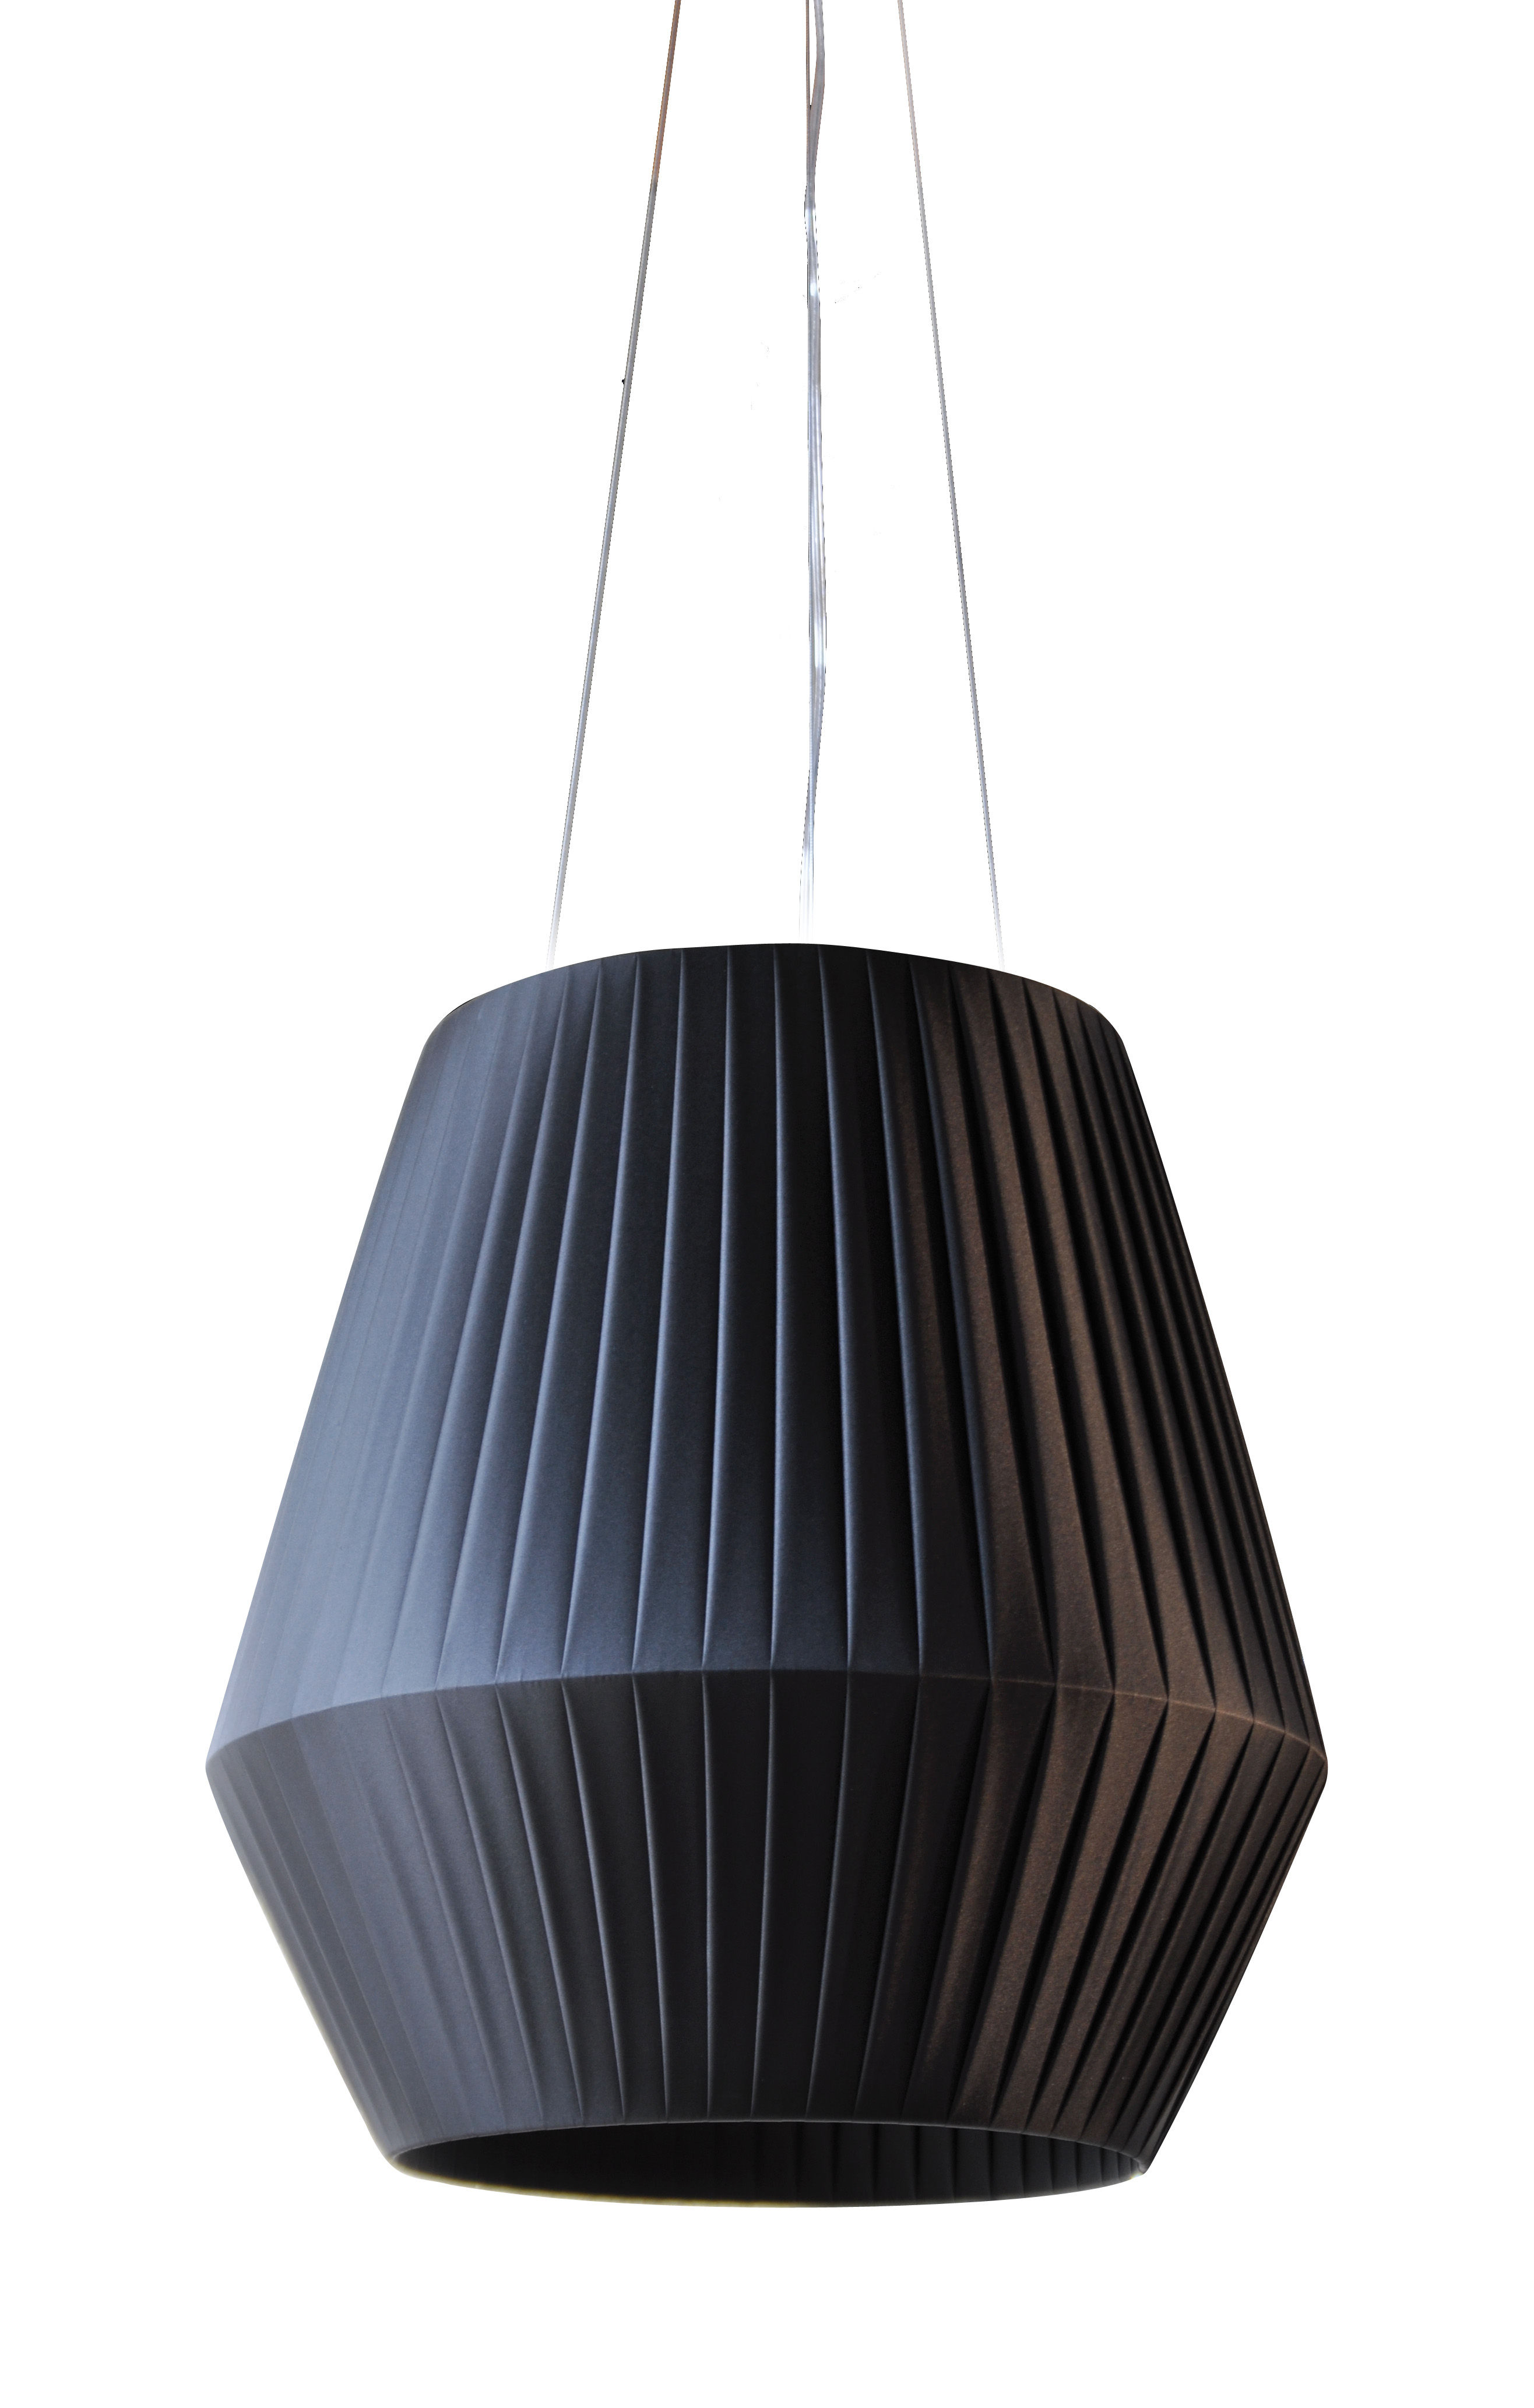 Illuminazione - Lampadari - Sospensione Ruban - Ø 45 cm di Dix Heures Dix - Nero - Tessuto poliestere